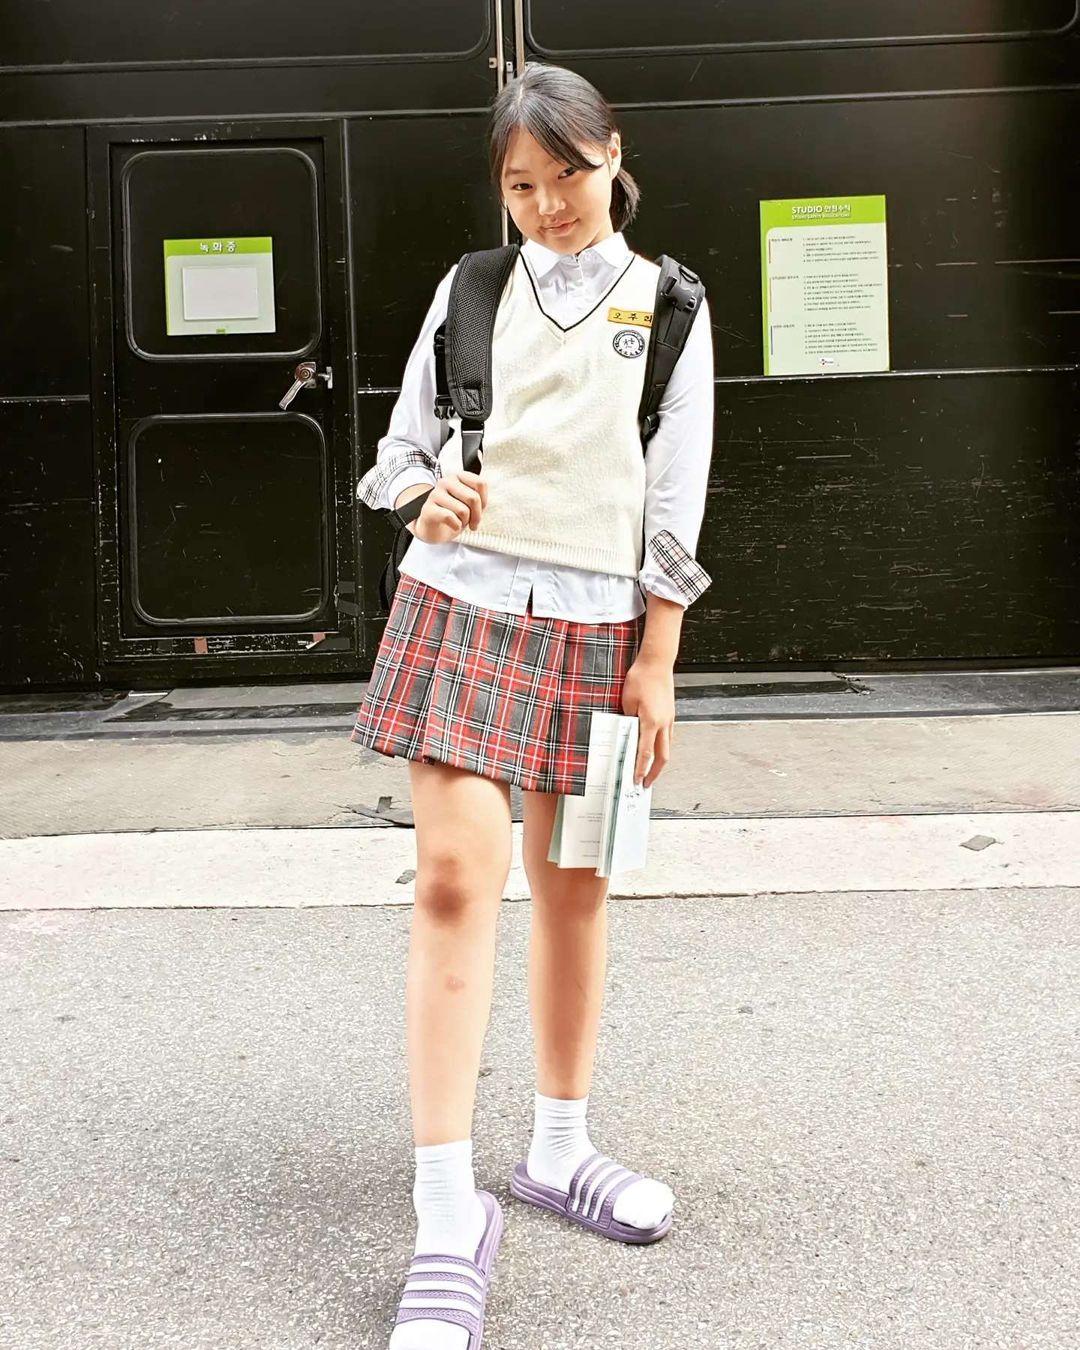 Kim Min Seo in Hometown Cha-Cha-Cha